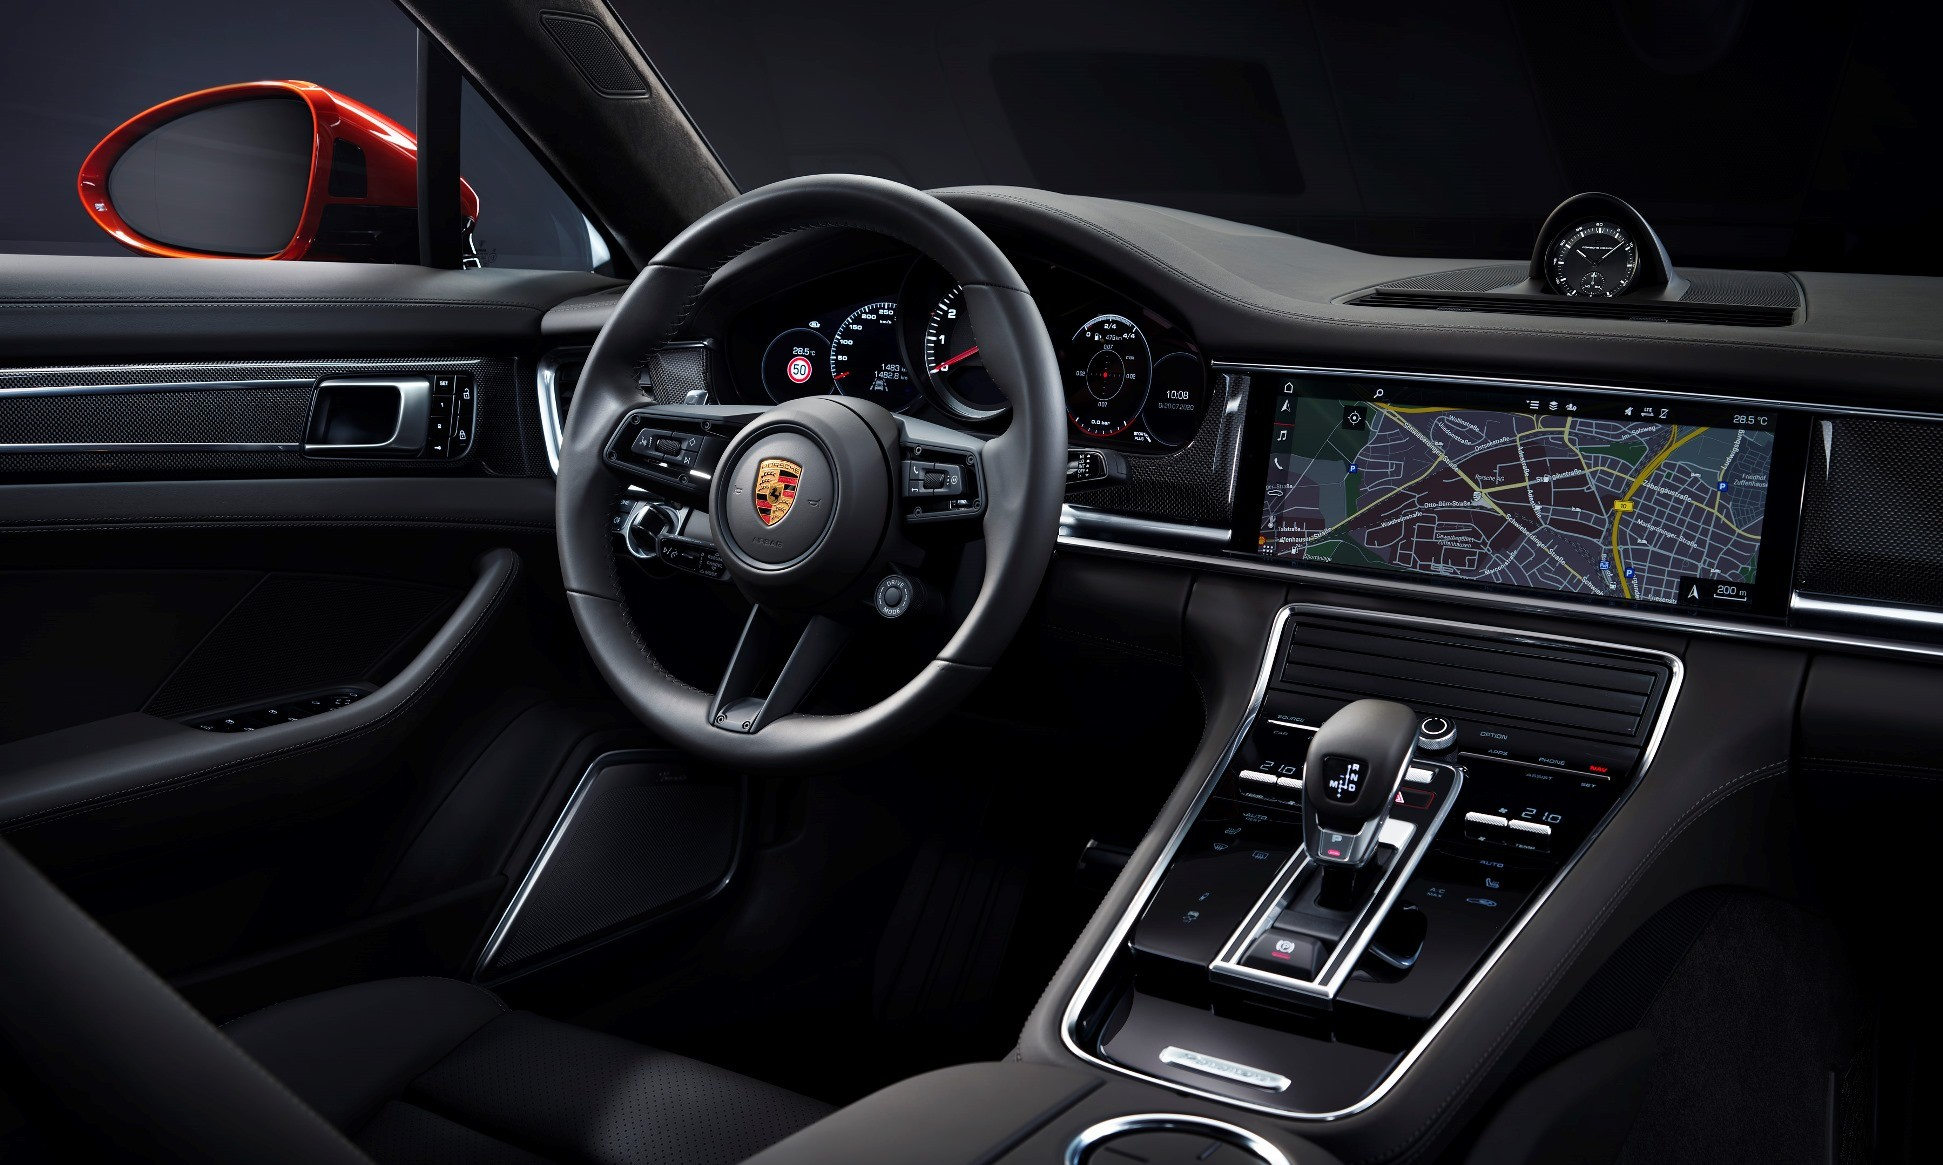 New Porsche Panamera interior